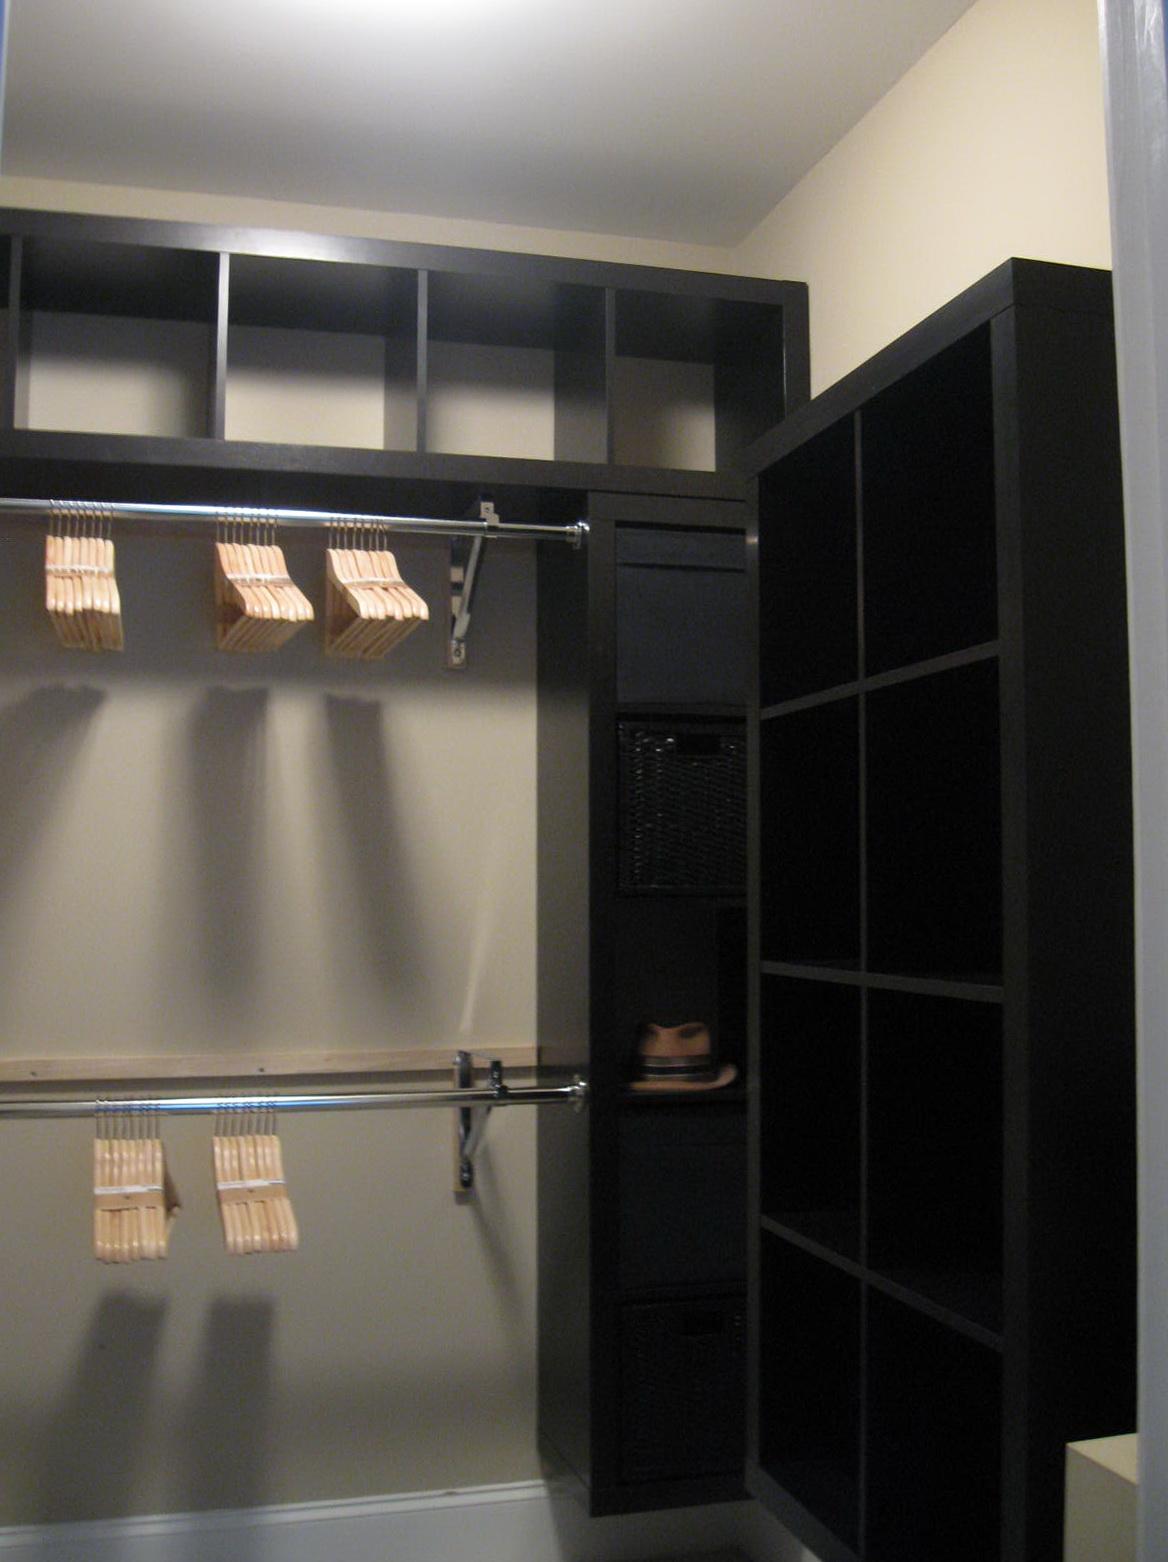 Ikea Closet Organizer Hack Home Design Ideas